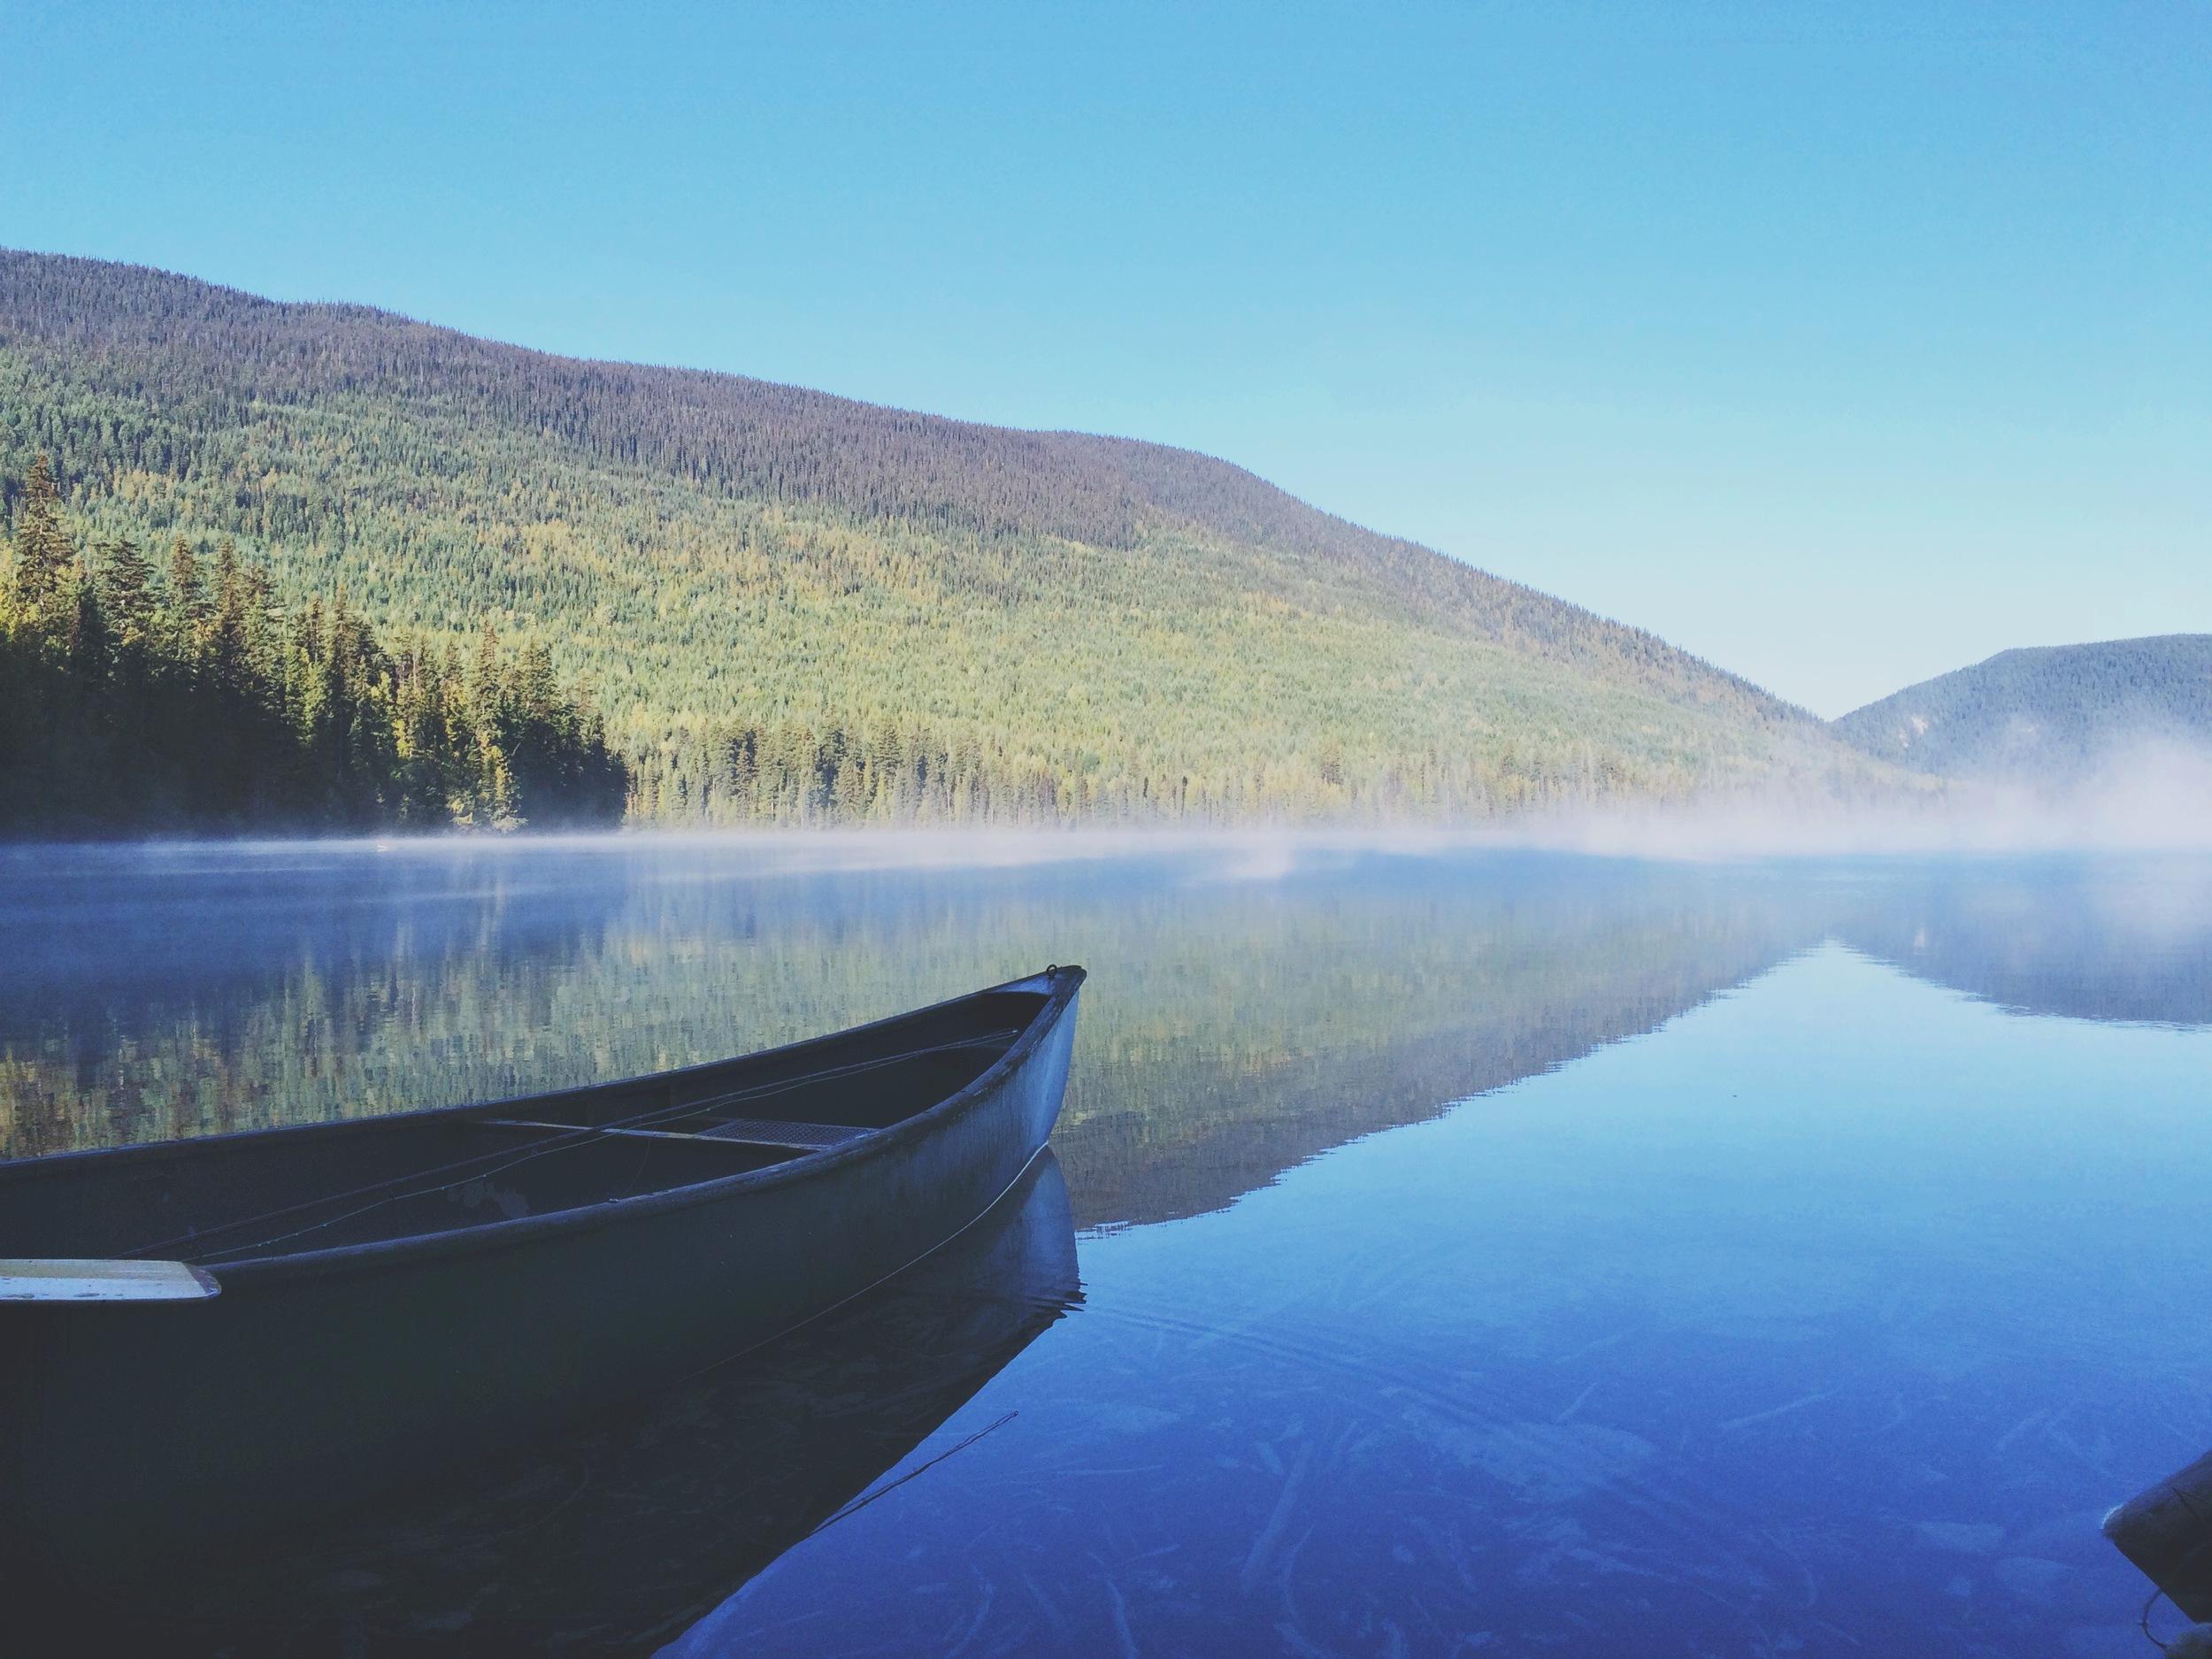 Johnson Lake early morning